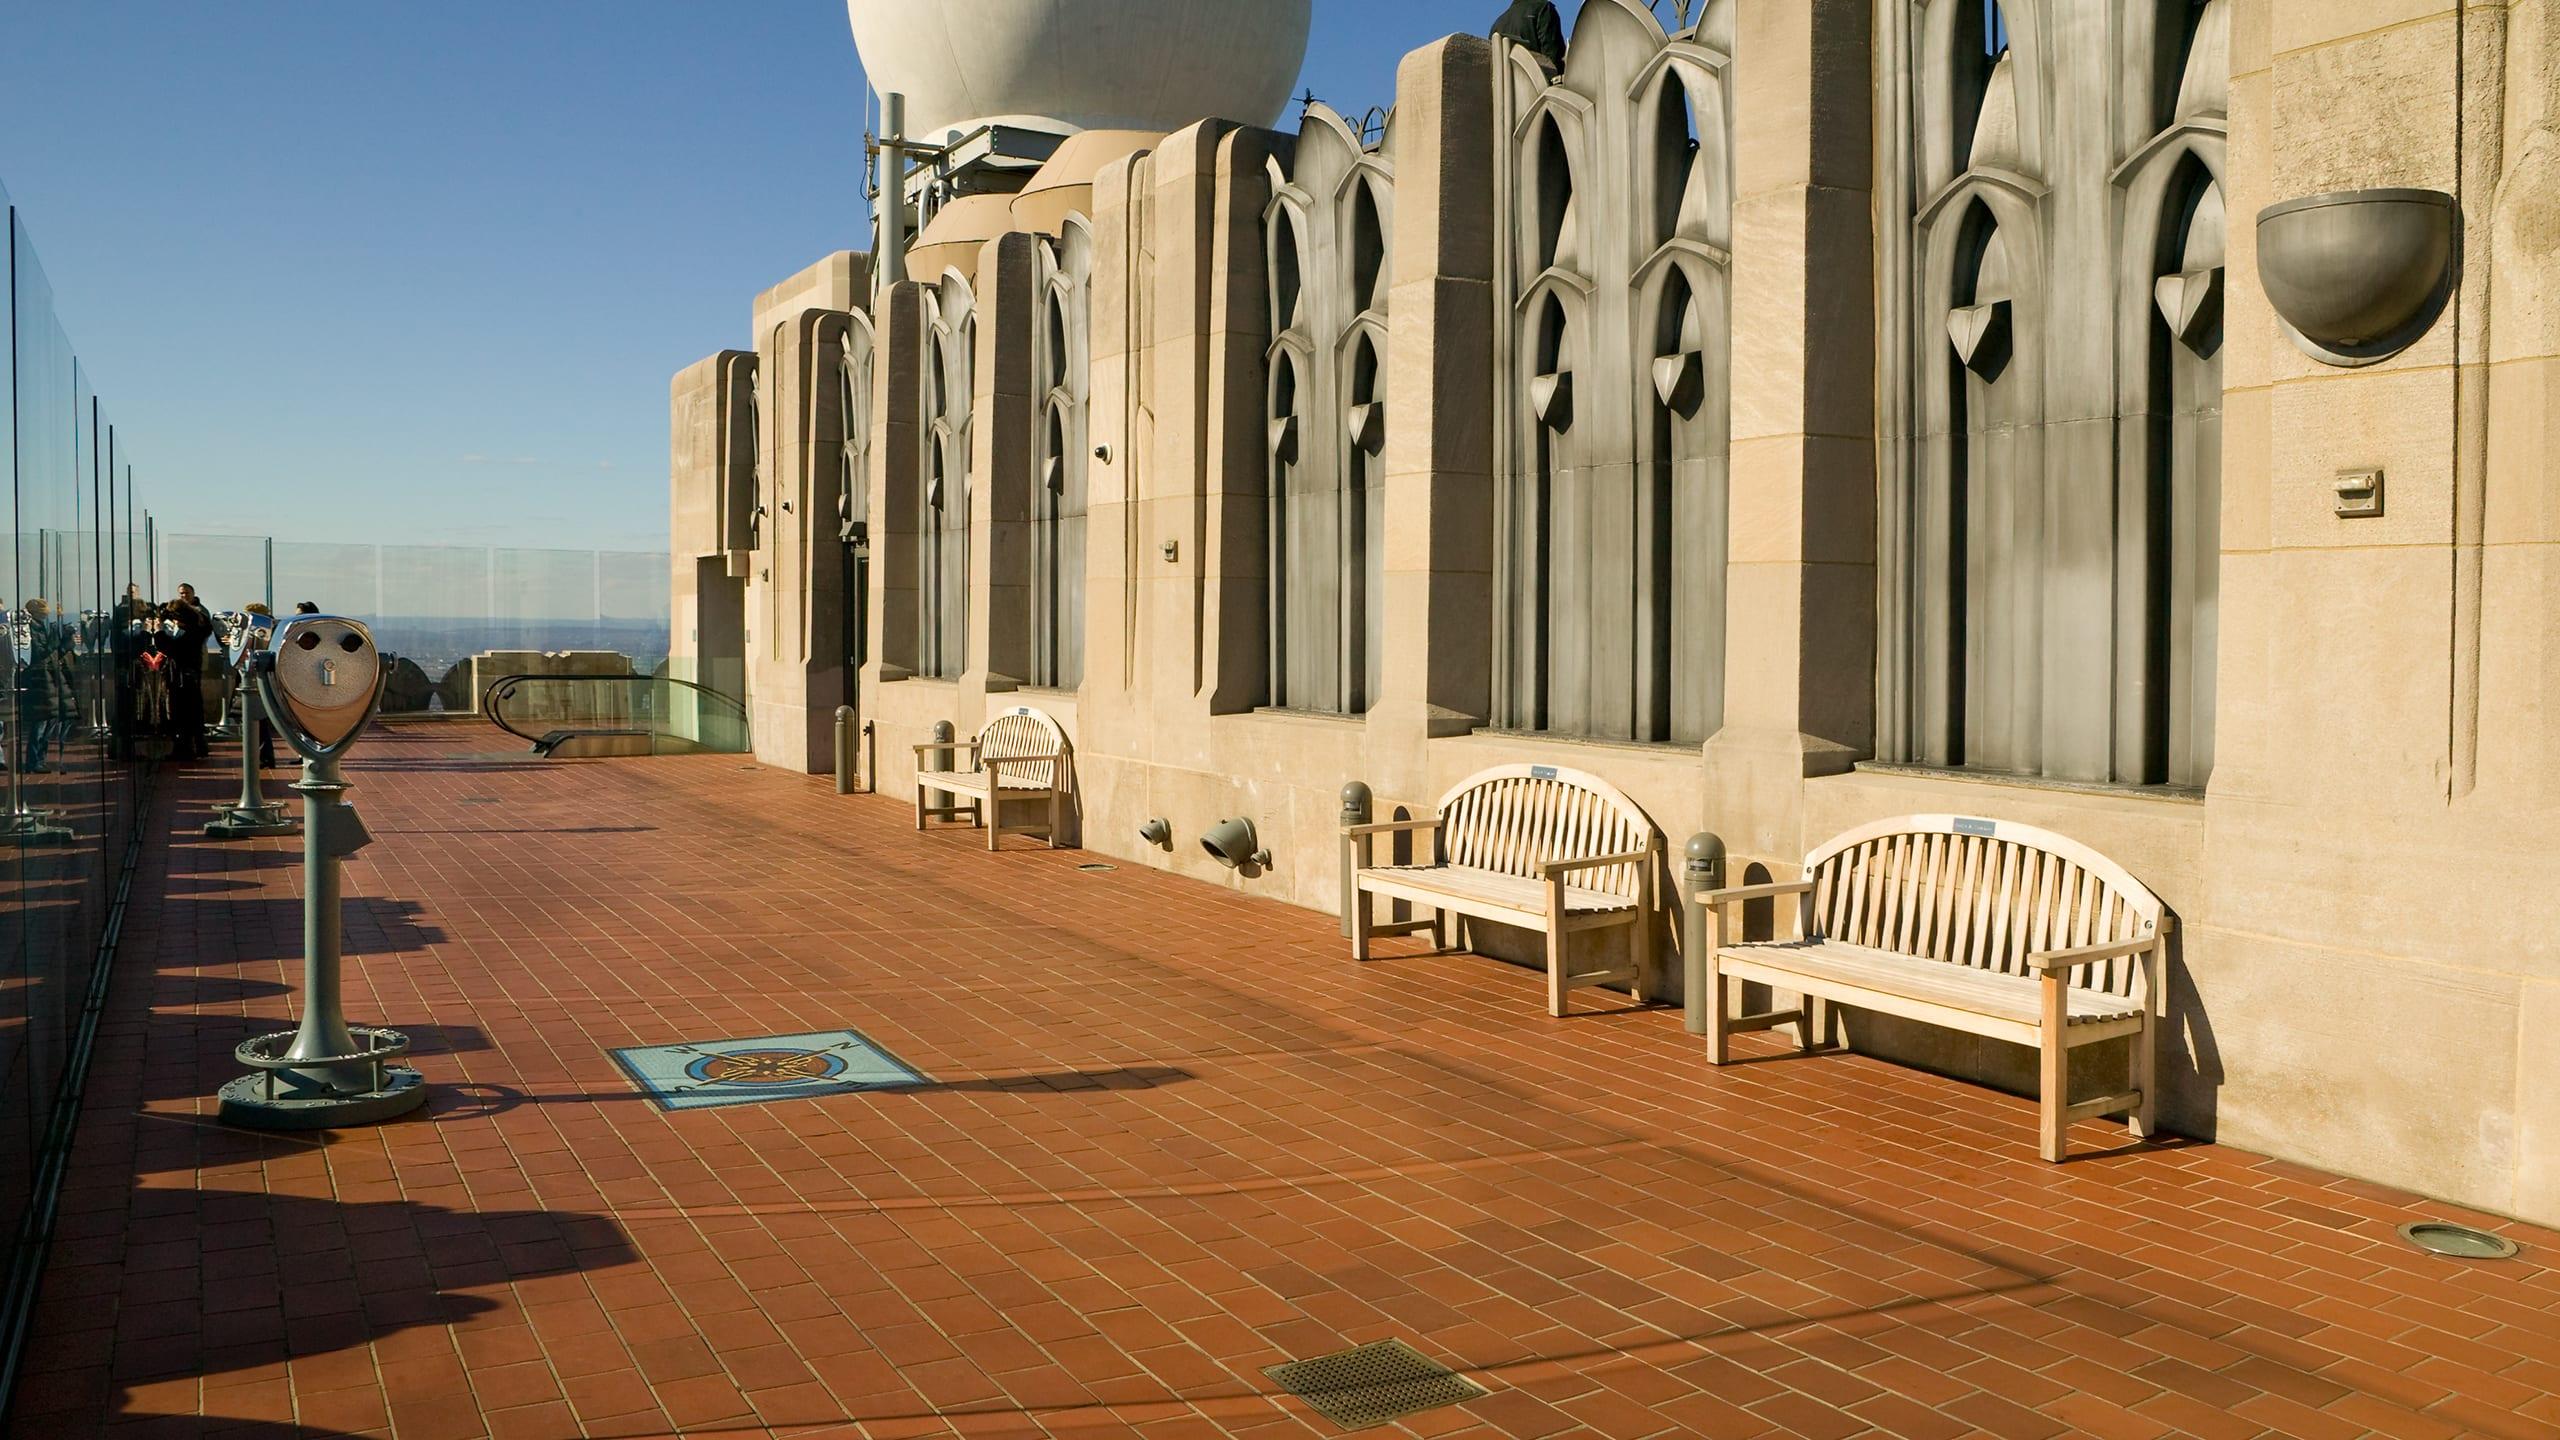 Top of the Rock - Rockefeller Center Ludowici Roof Tile